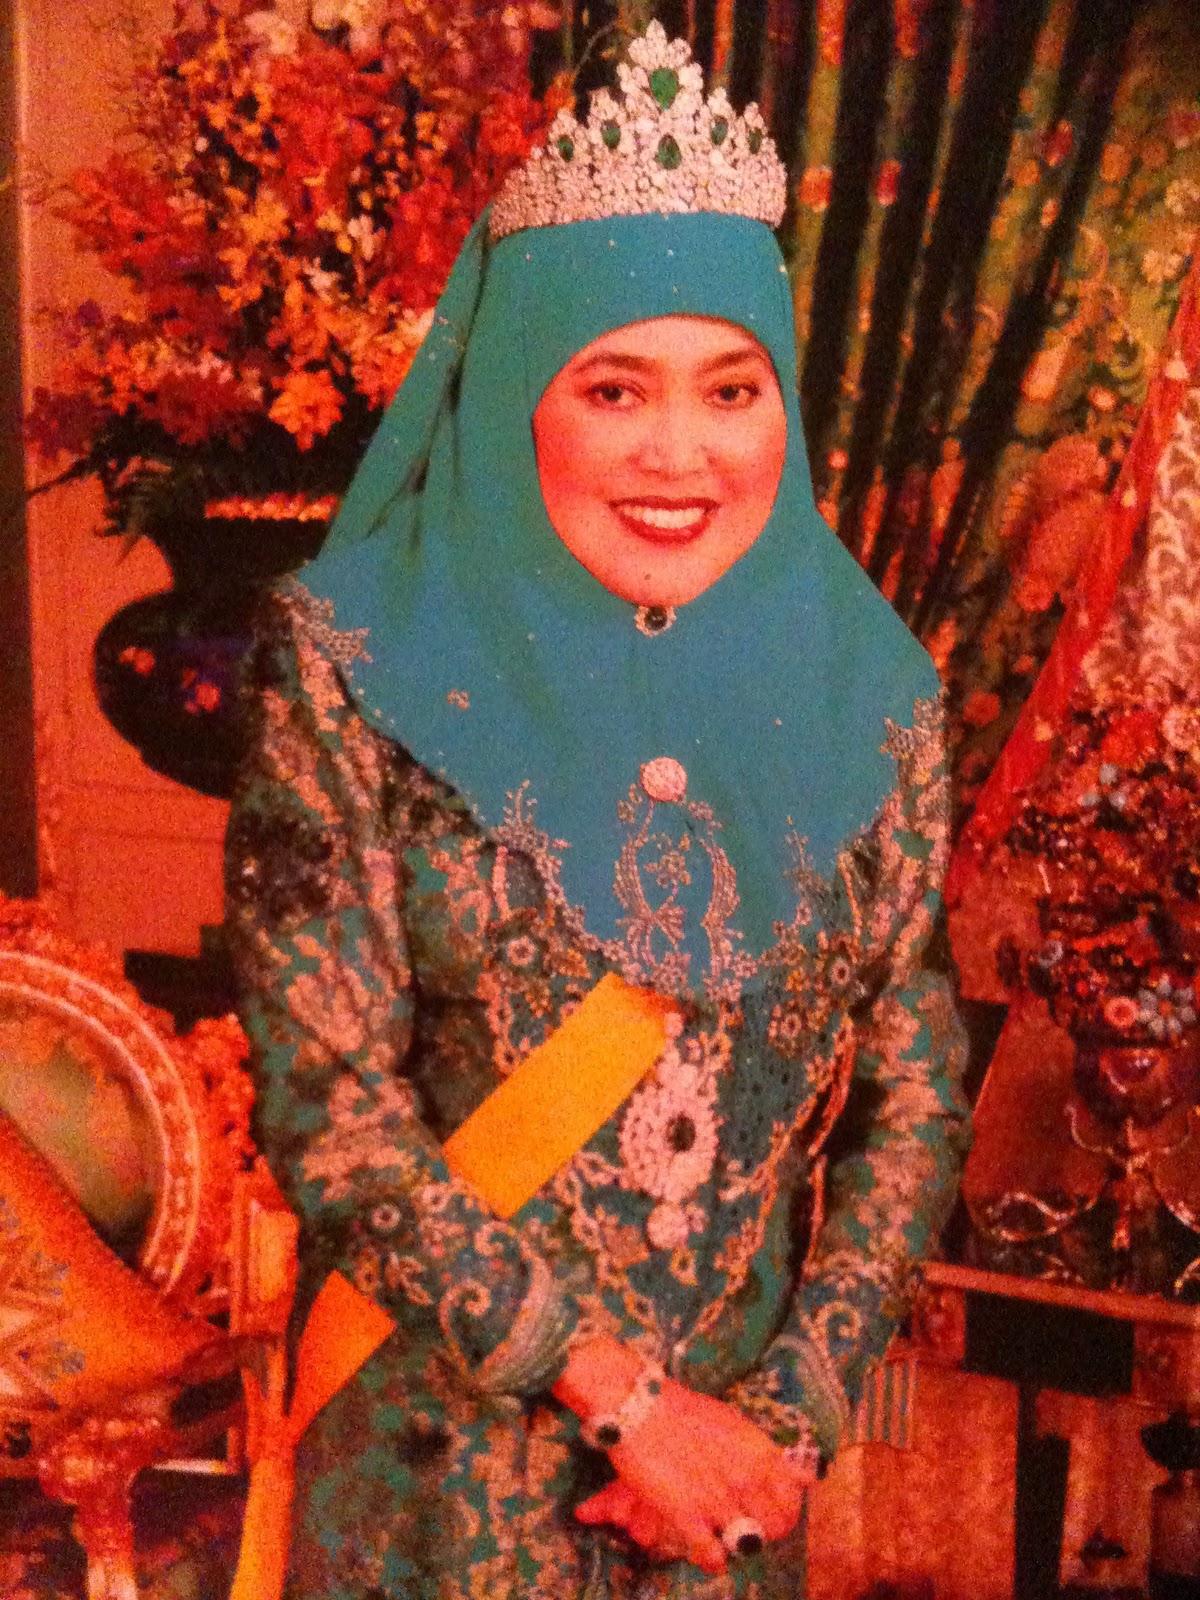 DYMM Raja Isteri Anak Hajah Saleha..Raja Isteri Brunei Darussalam..